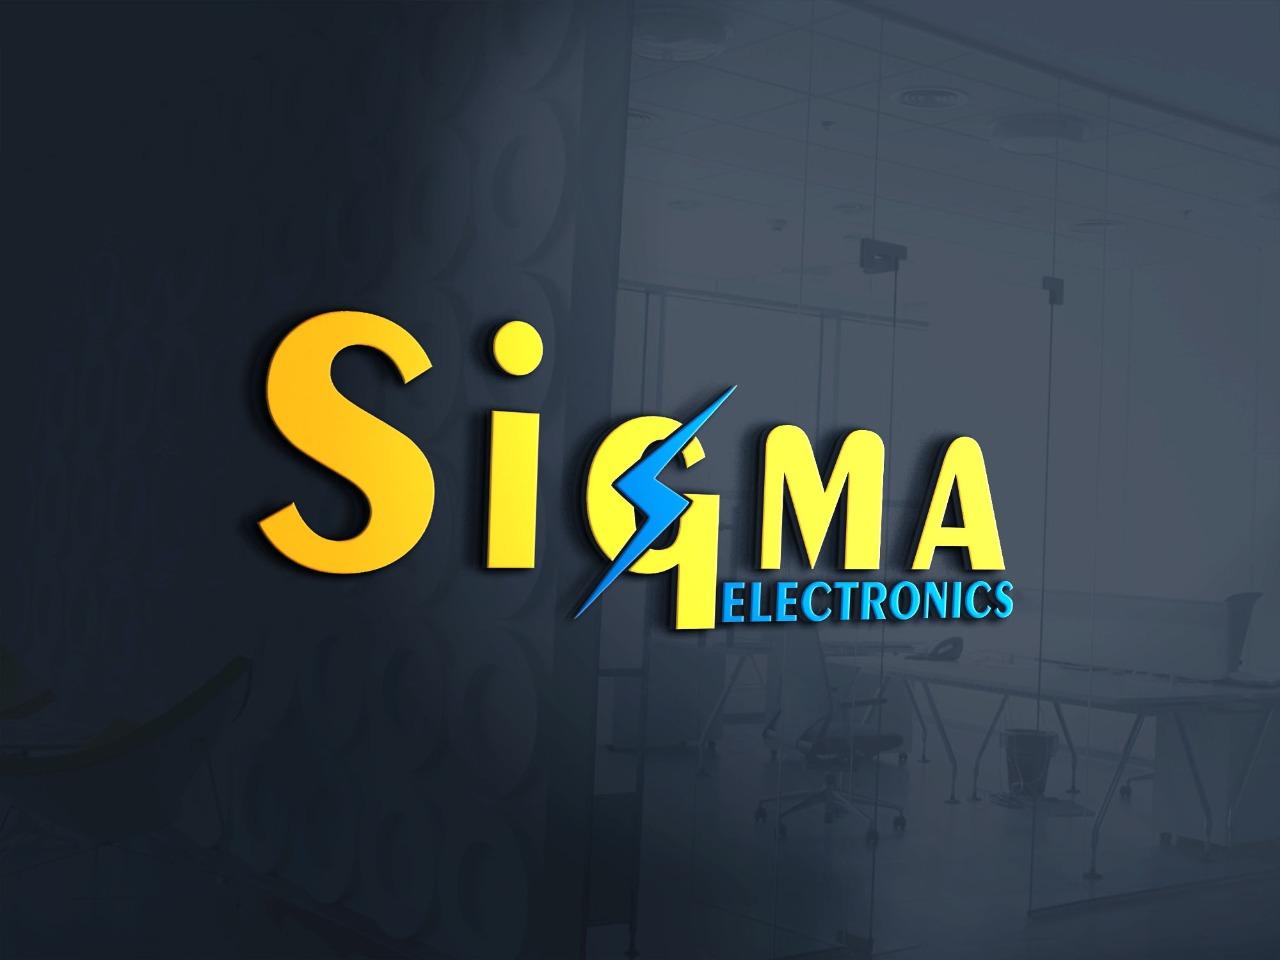 SIGMA ELECTRONICS